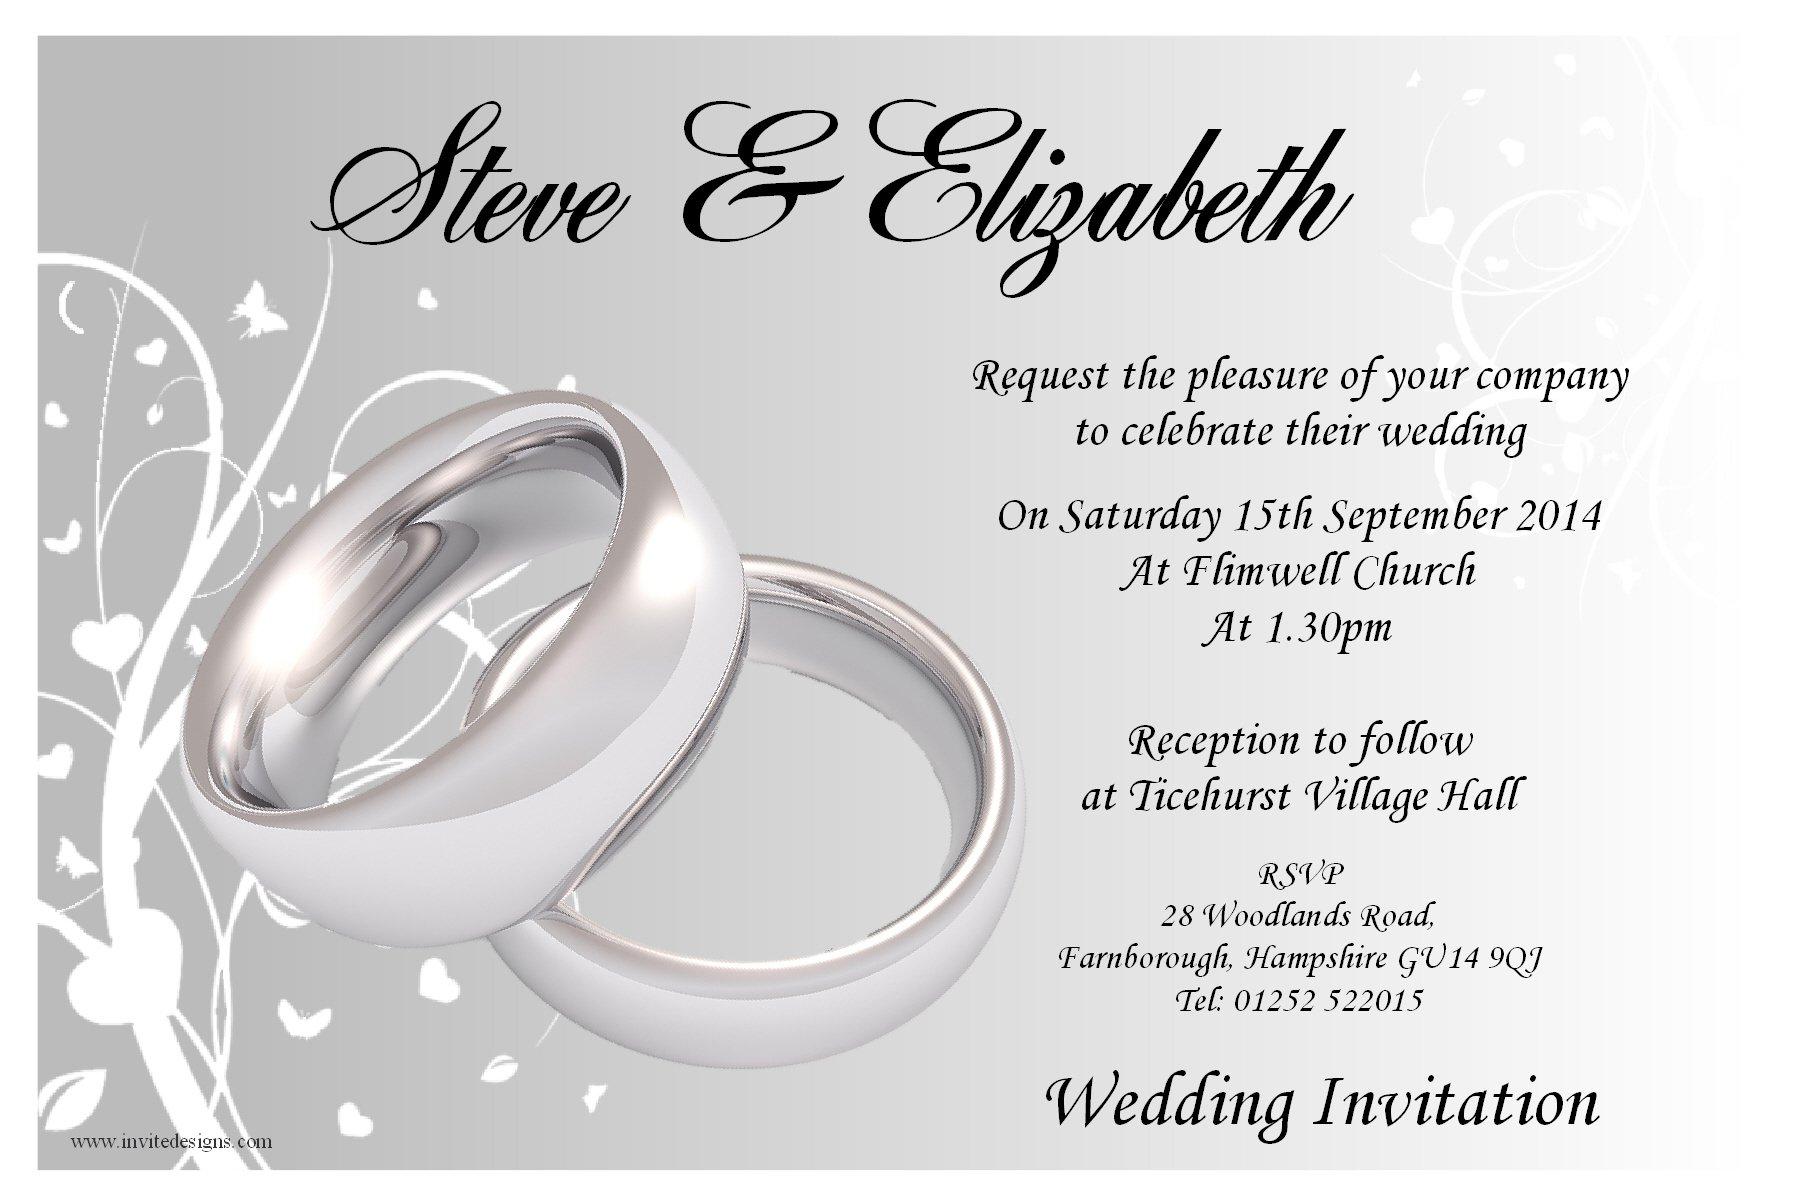 Wedding And Reception Invitations: Blank Reception Invitations